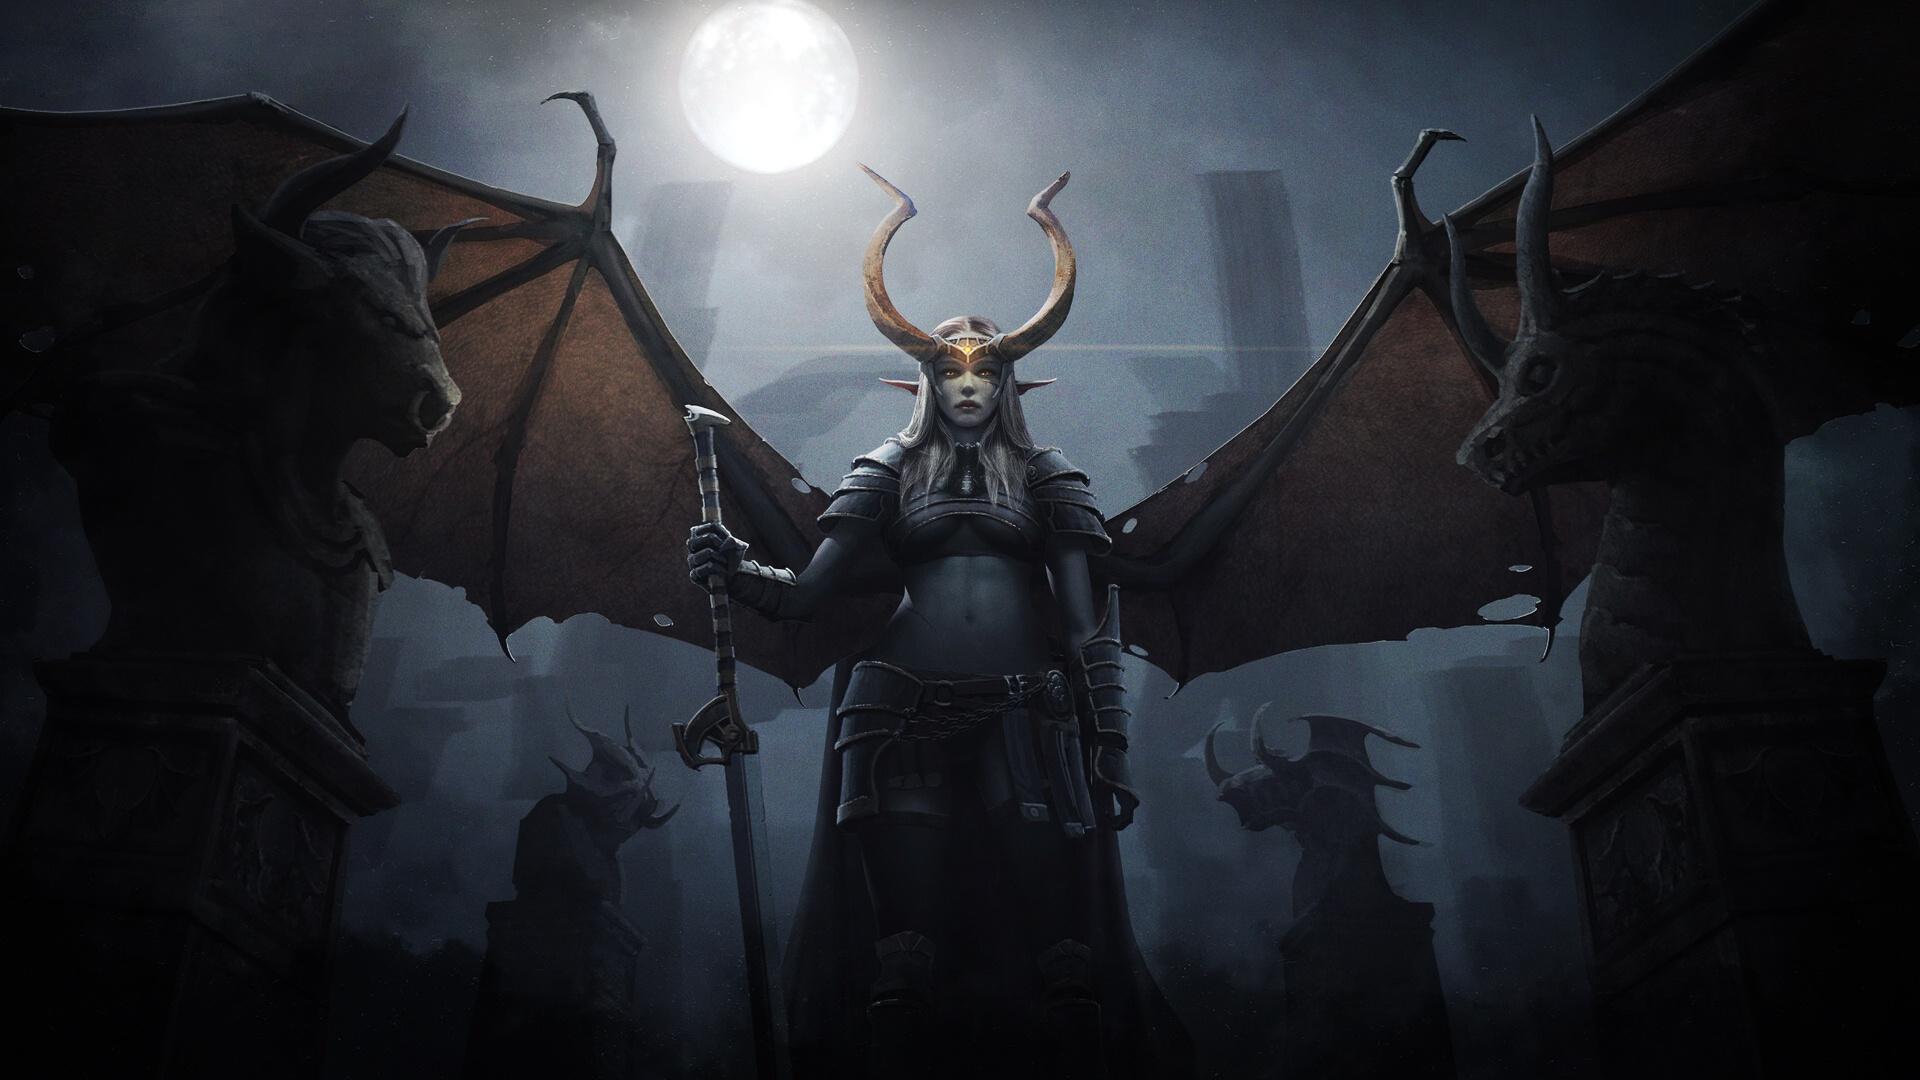 General 1920x1080 dark warrior fantasy art fantasy girl wings frontal view centered low-angle belly underboob horns statue bust moonlight women pointy ears sword artwork lights